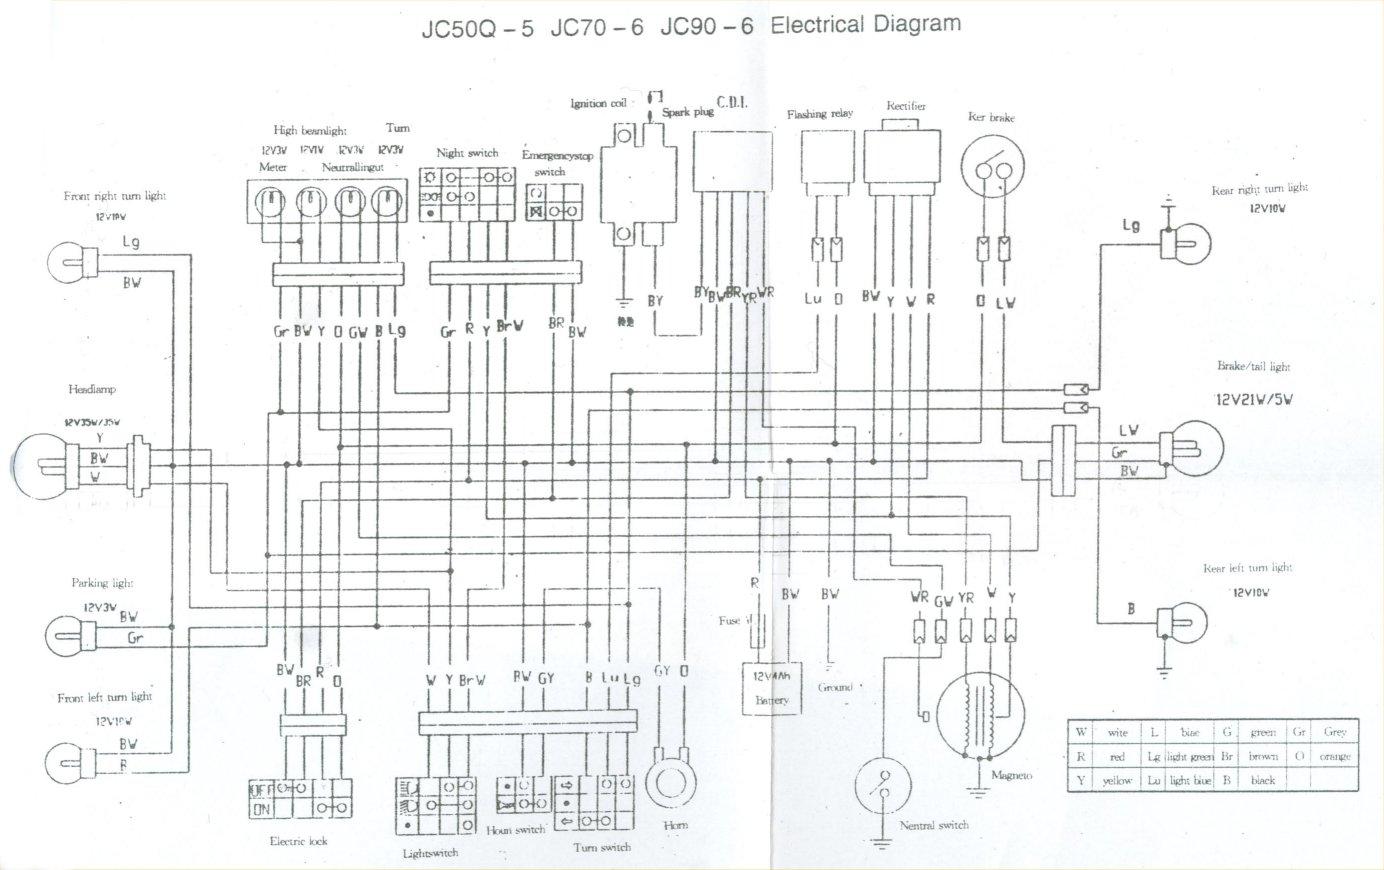 honda ss50 wiring diagram christianity judaism islam venn le site de dapi dax st50 st70 z50 ab23 la